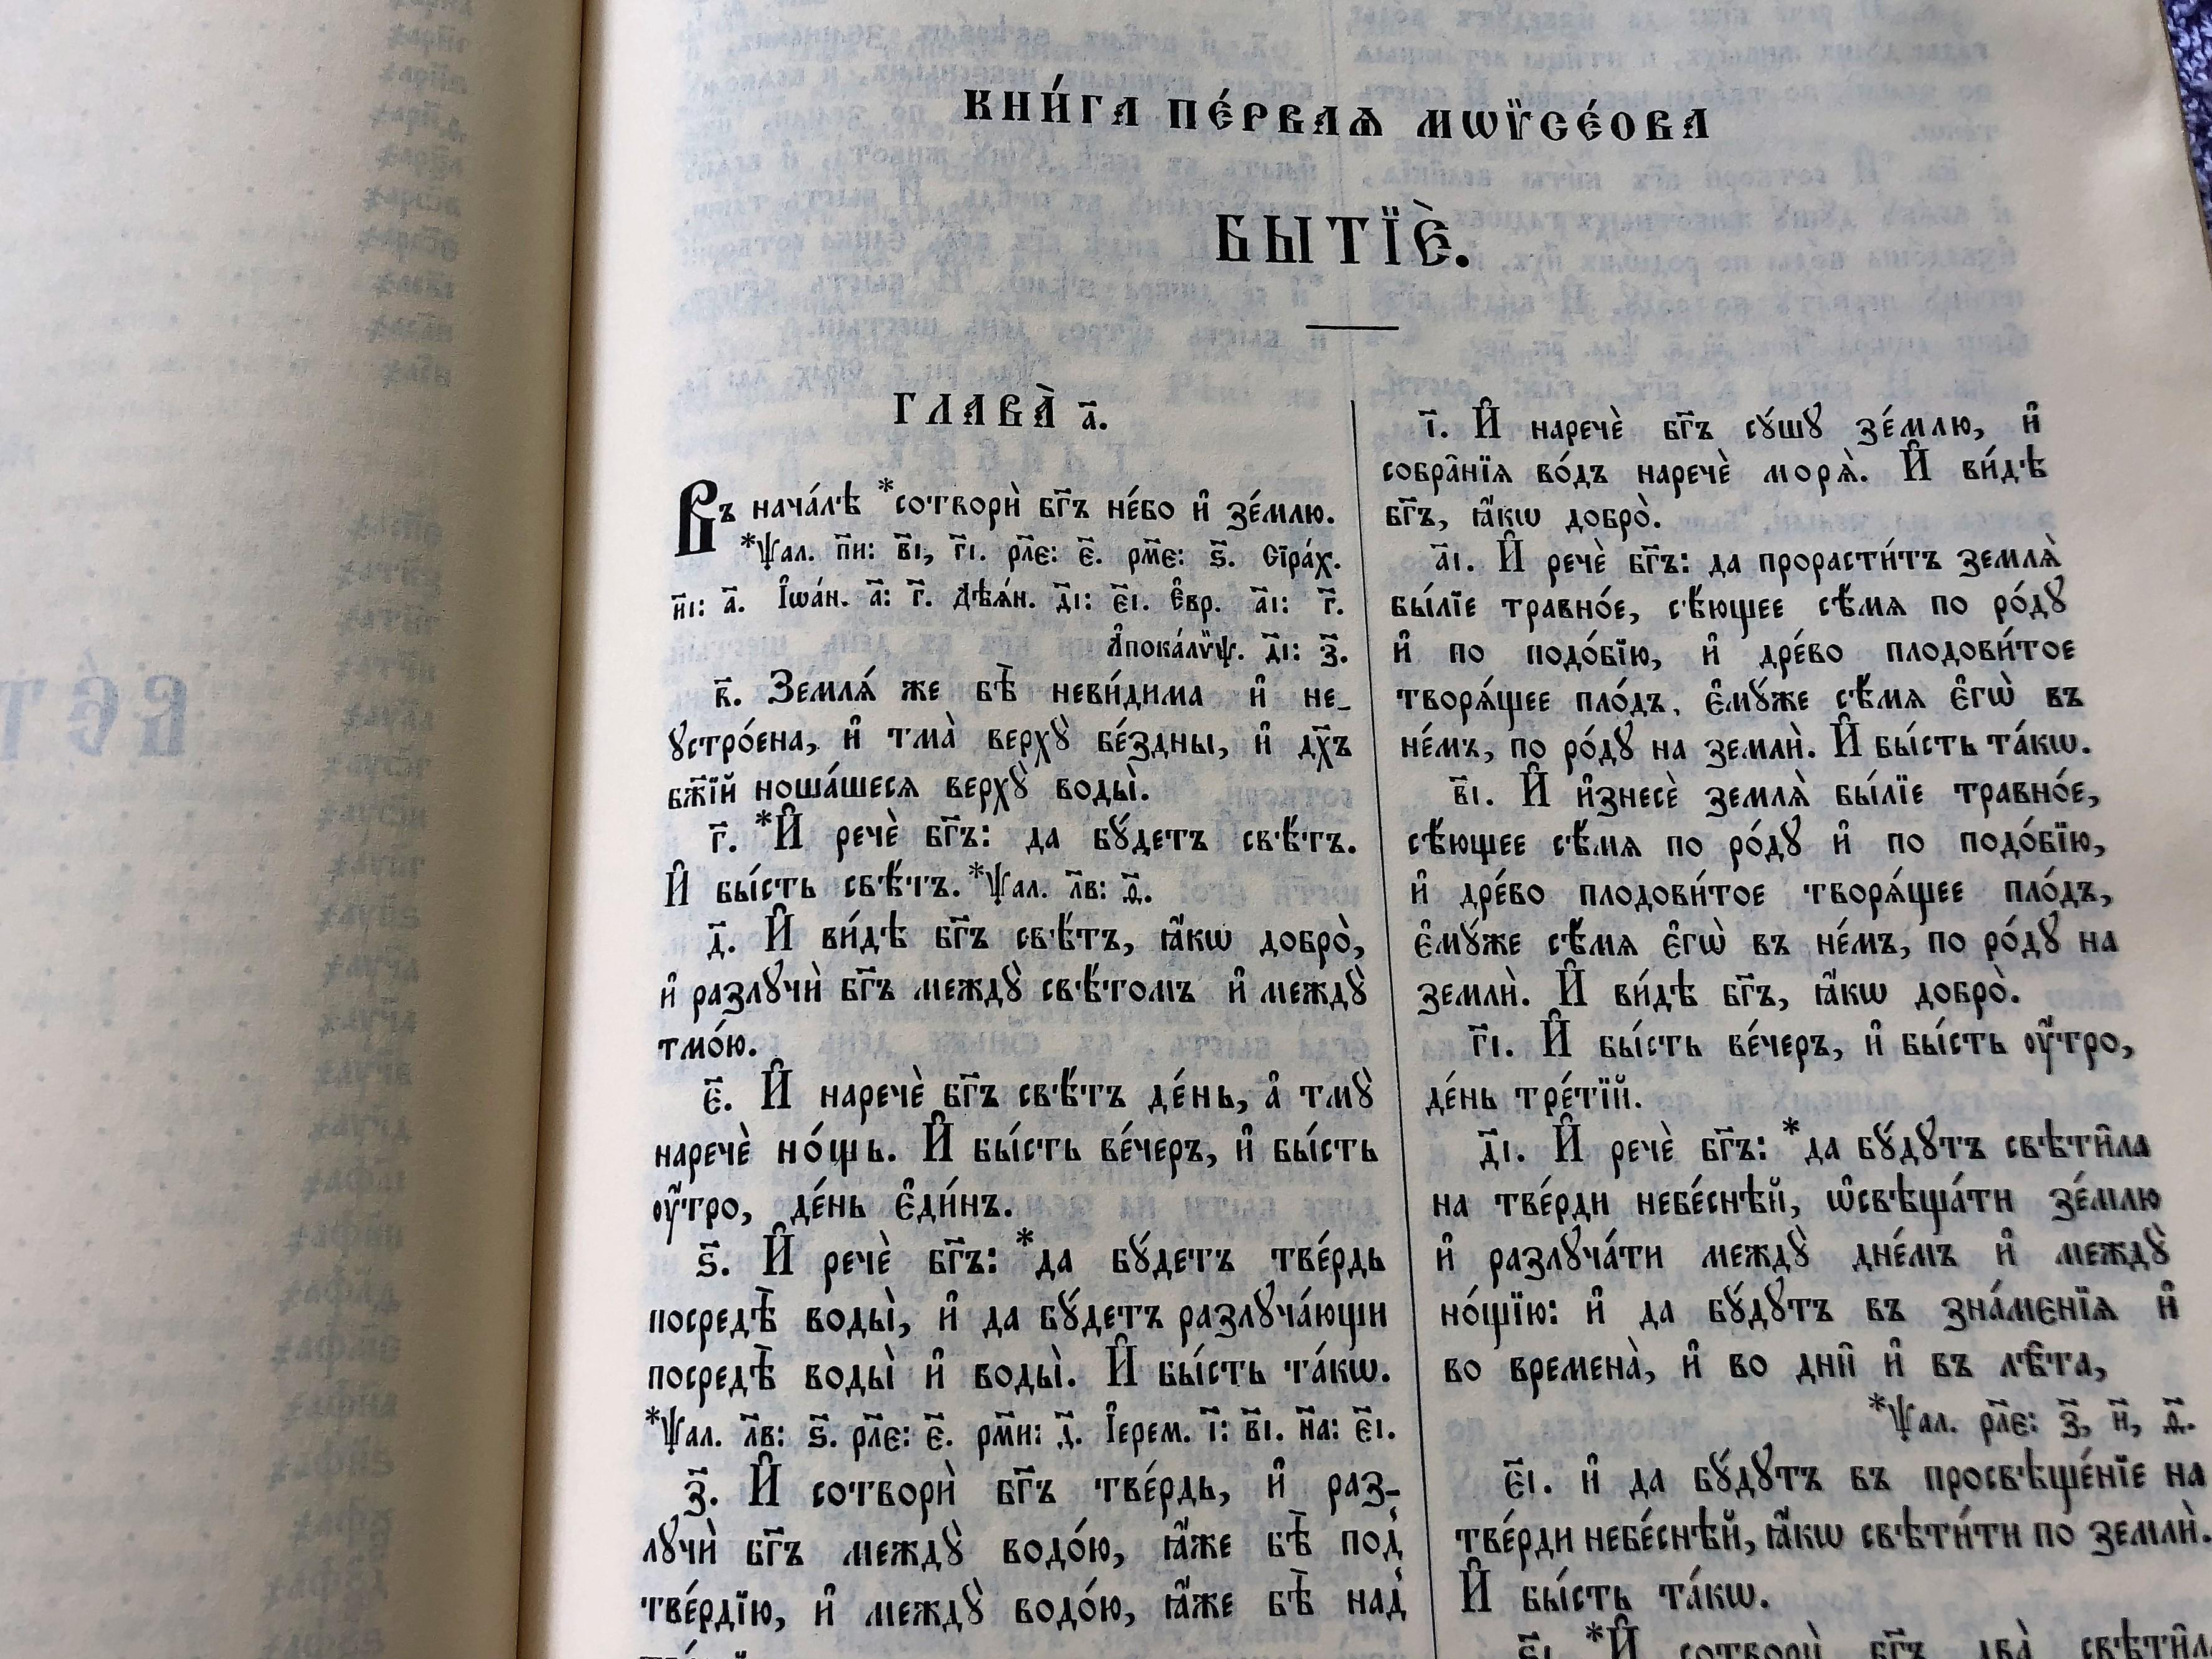 old-church-slavic-bible-beautiful-luxury-leather-bound-bible-green-12-.jpg